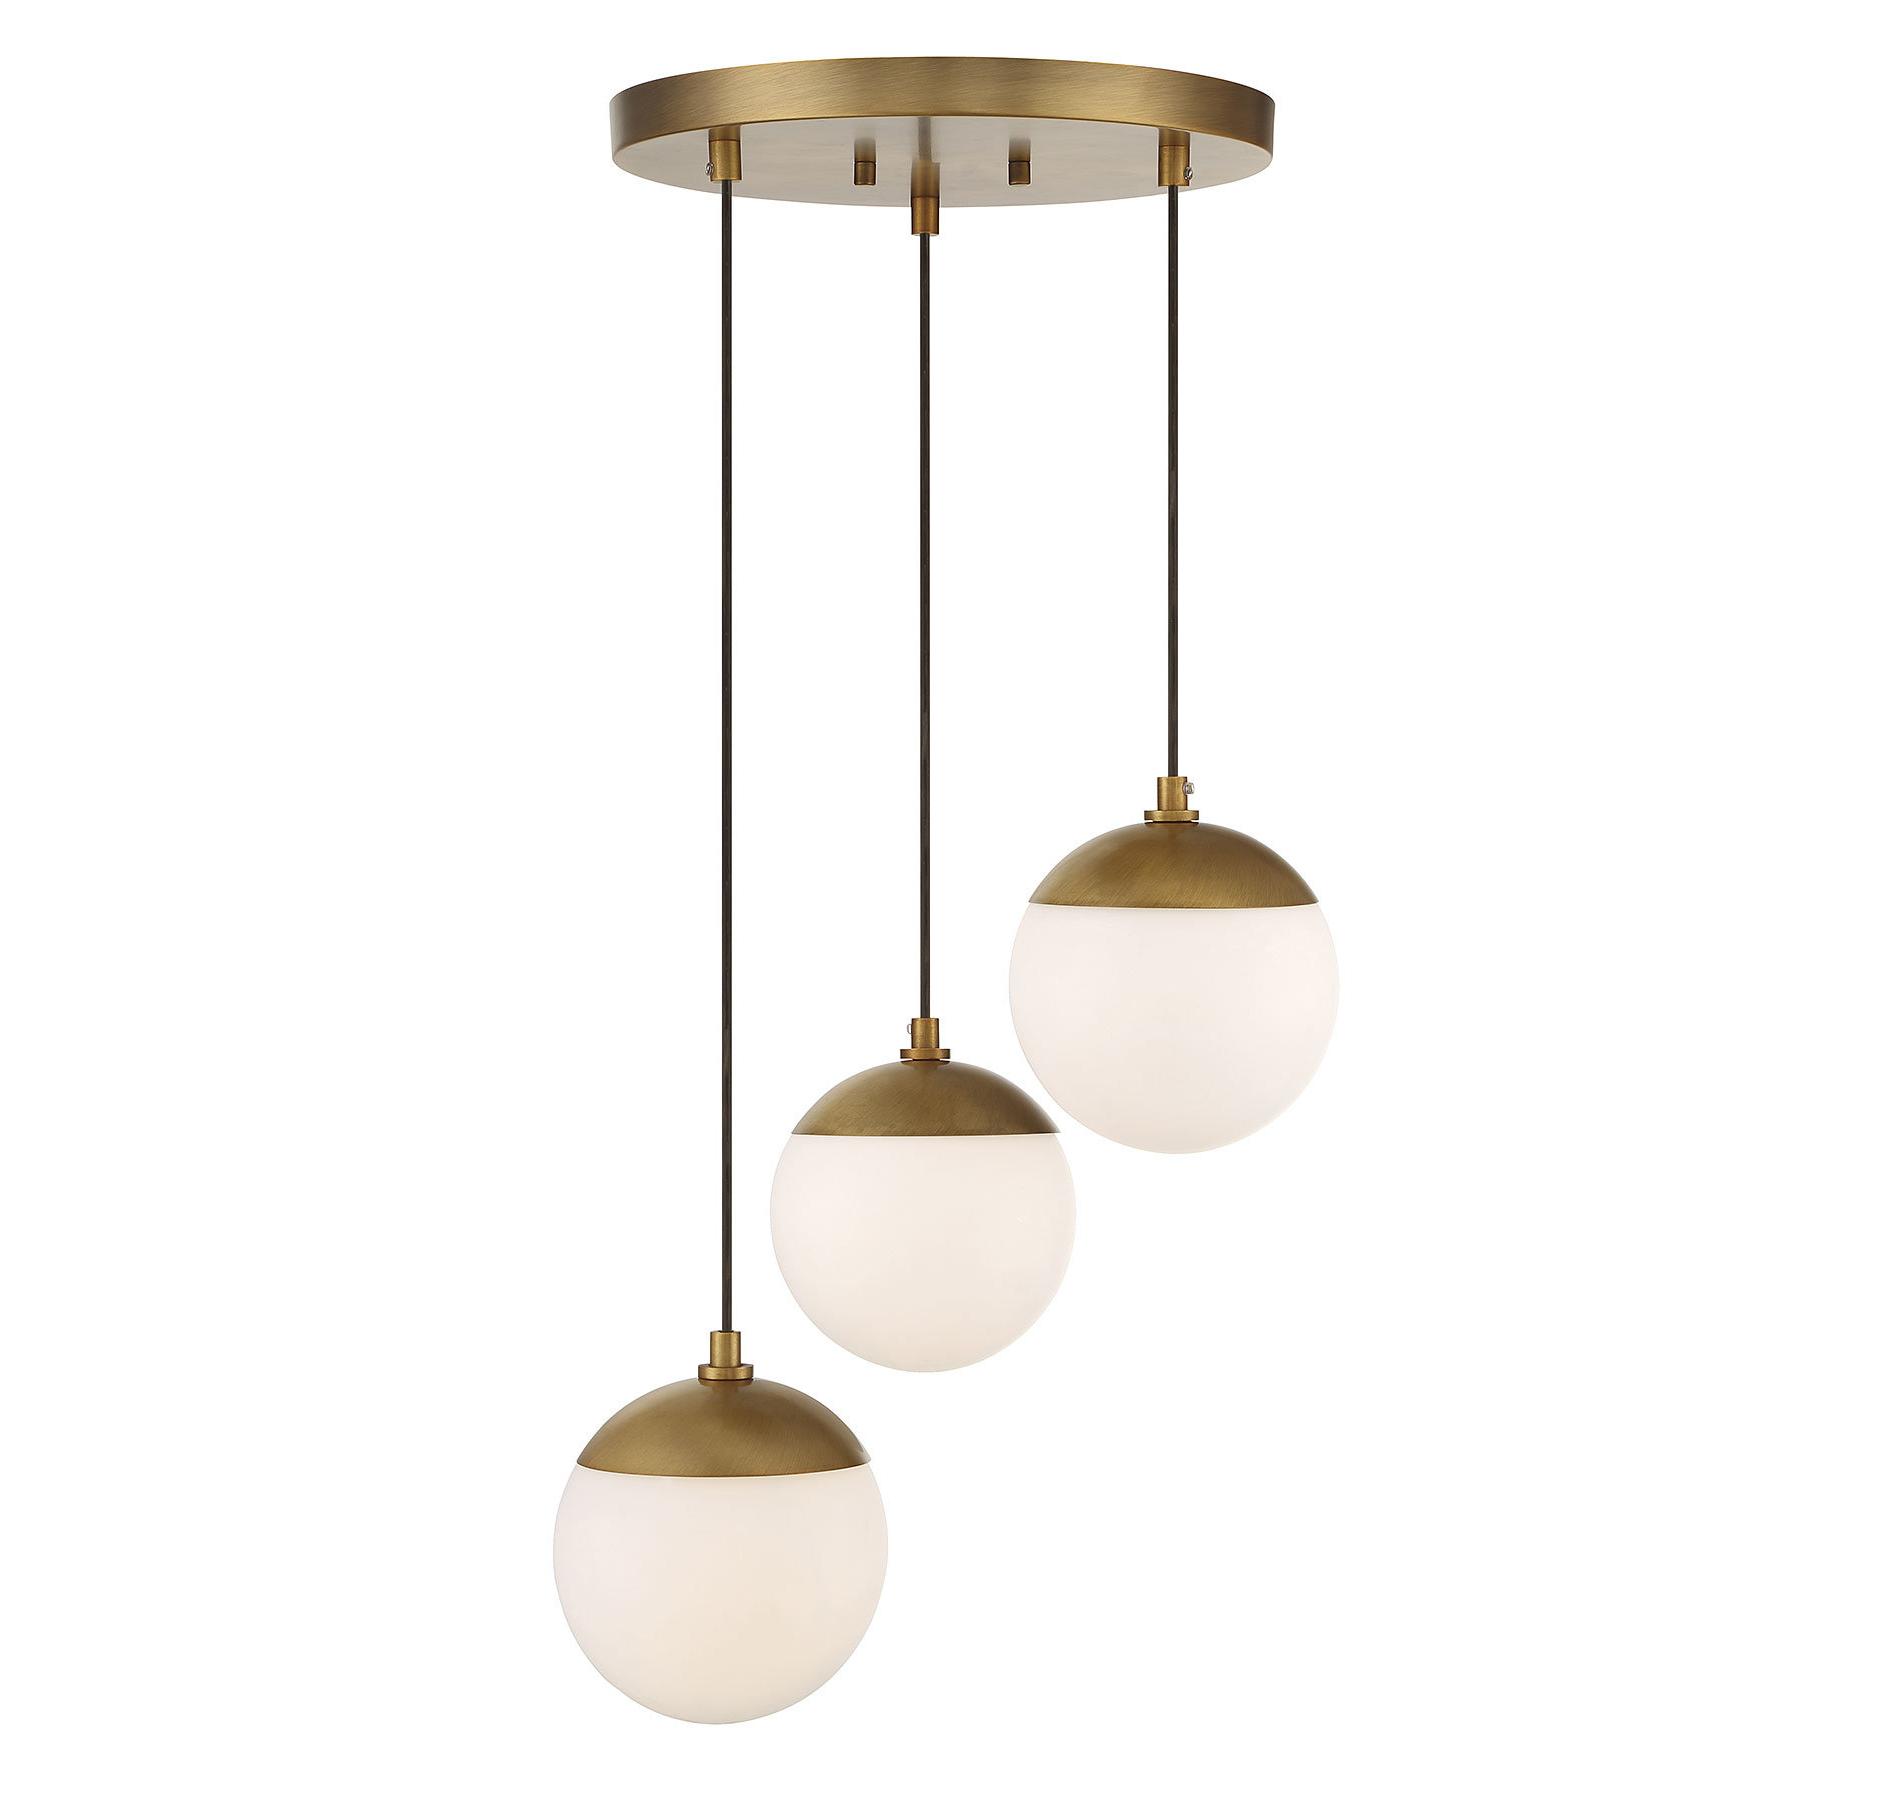 2020 Bautista 1 Light Single Globe Pendants Regarding Kara 3 Light Cluster Globe Pendant (View 15 of 25)